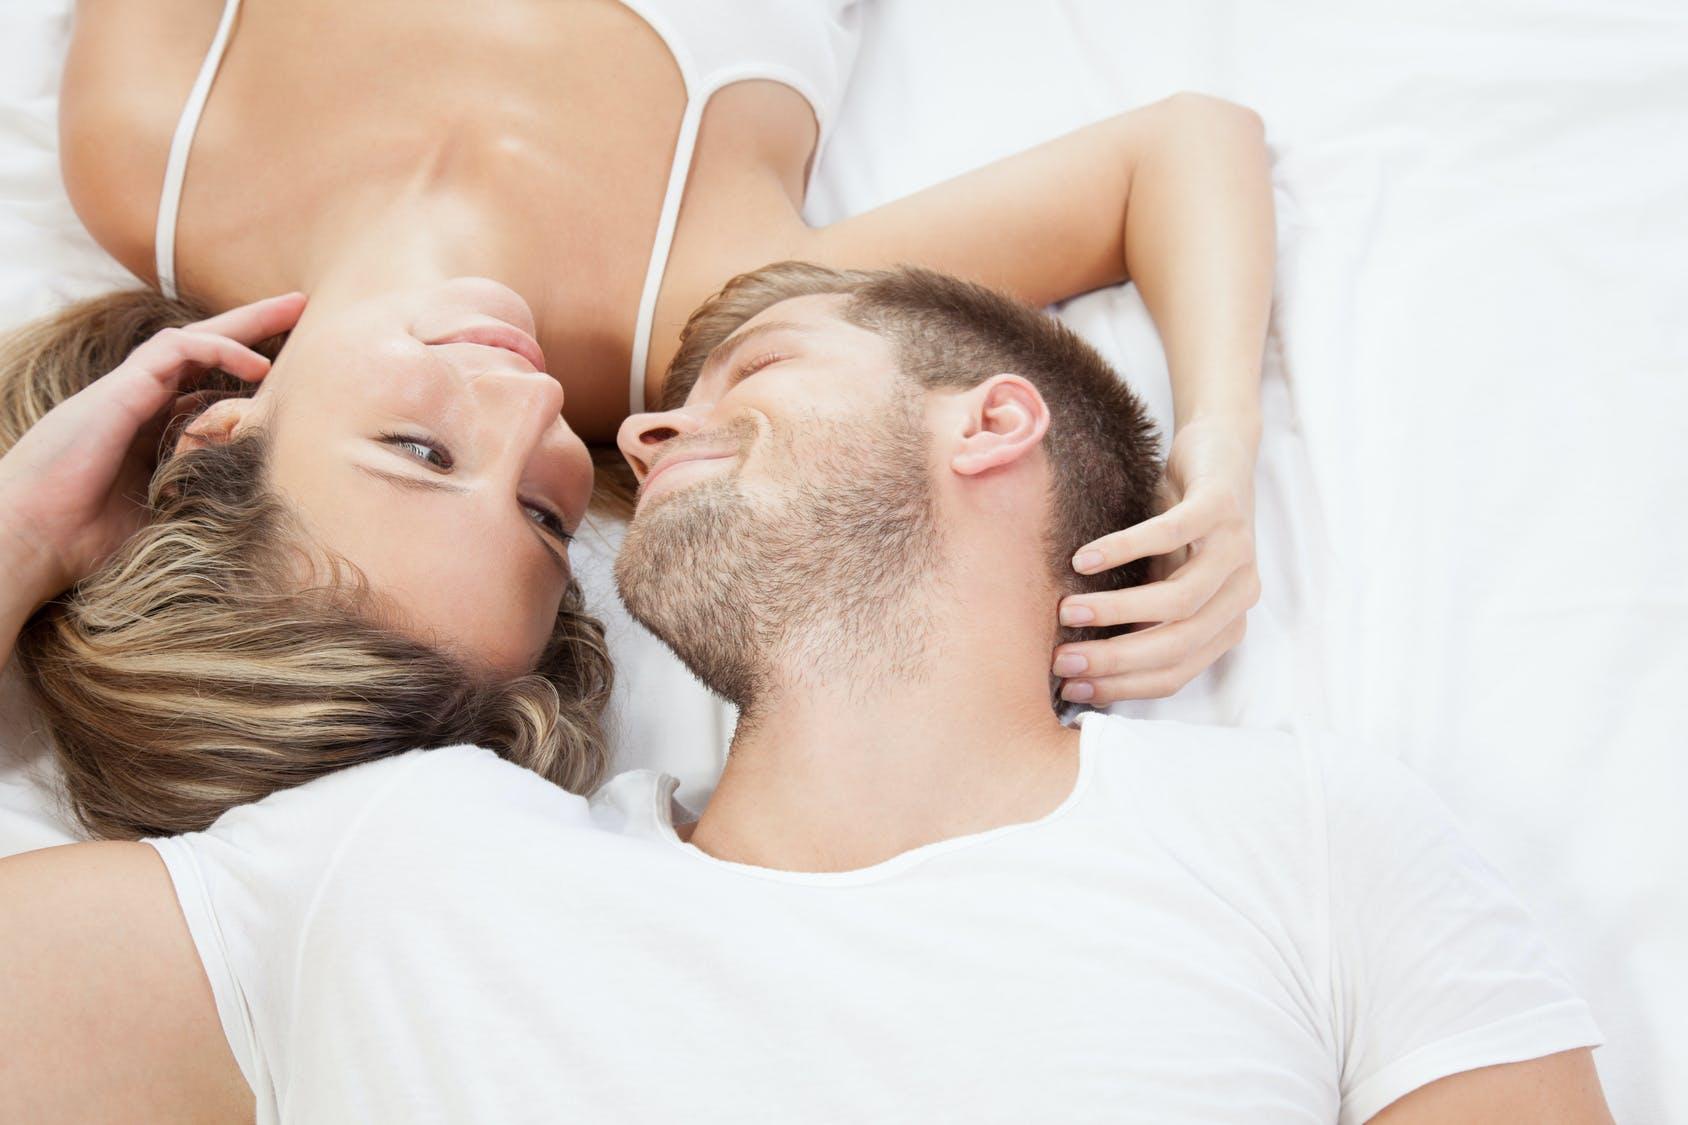 Video tehnika seksa